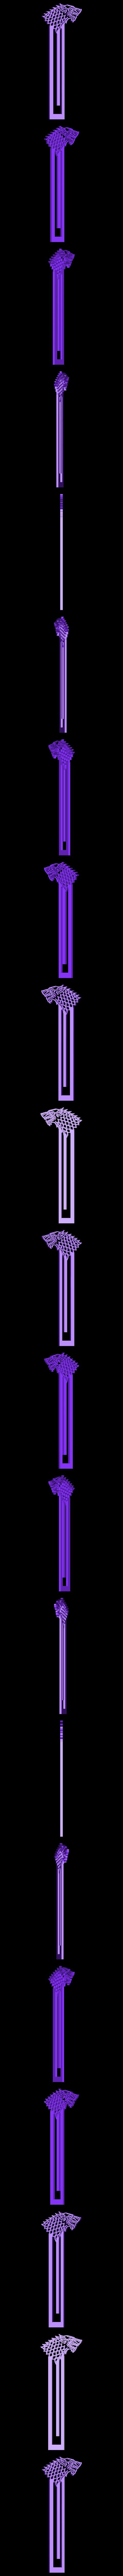 GOT_Stark_House.stl Download free STL file All my tabs • 3D printer model, Gonzalor